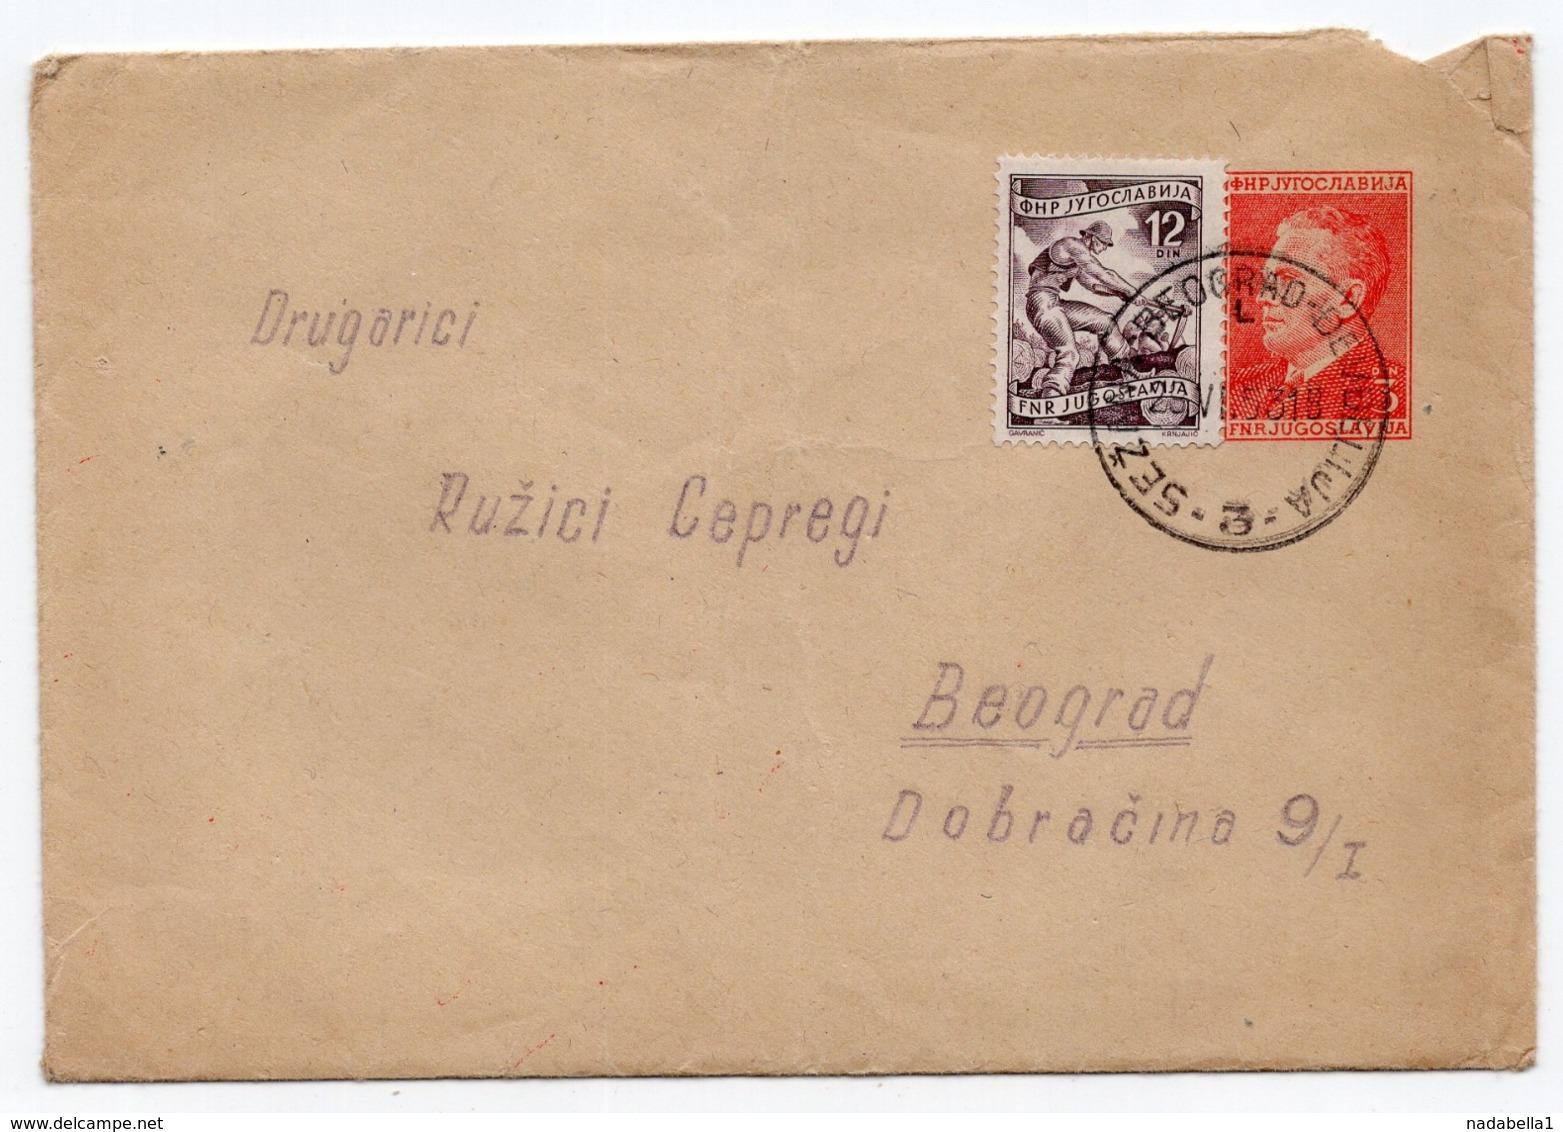 1953 FNR YUGOSLAVIA, SLOVENIA, TPO 3 SEZANA-BEOGRAD-DJEVDJELIJA, STATIONARY COVER - Postal Stationery